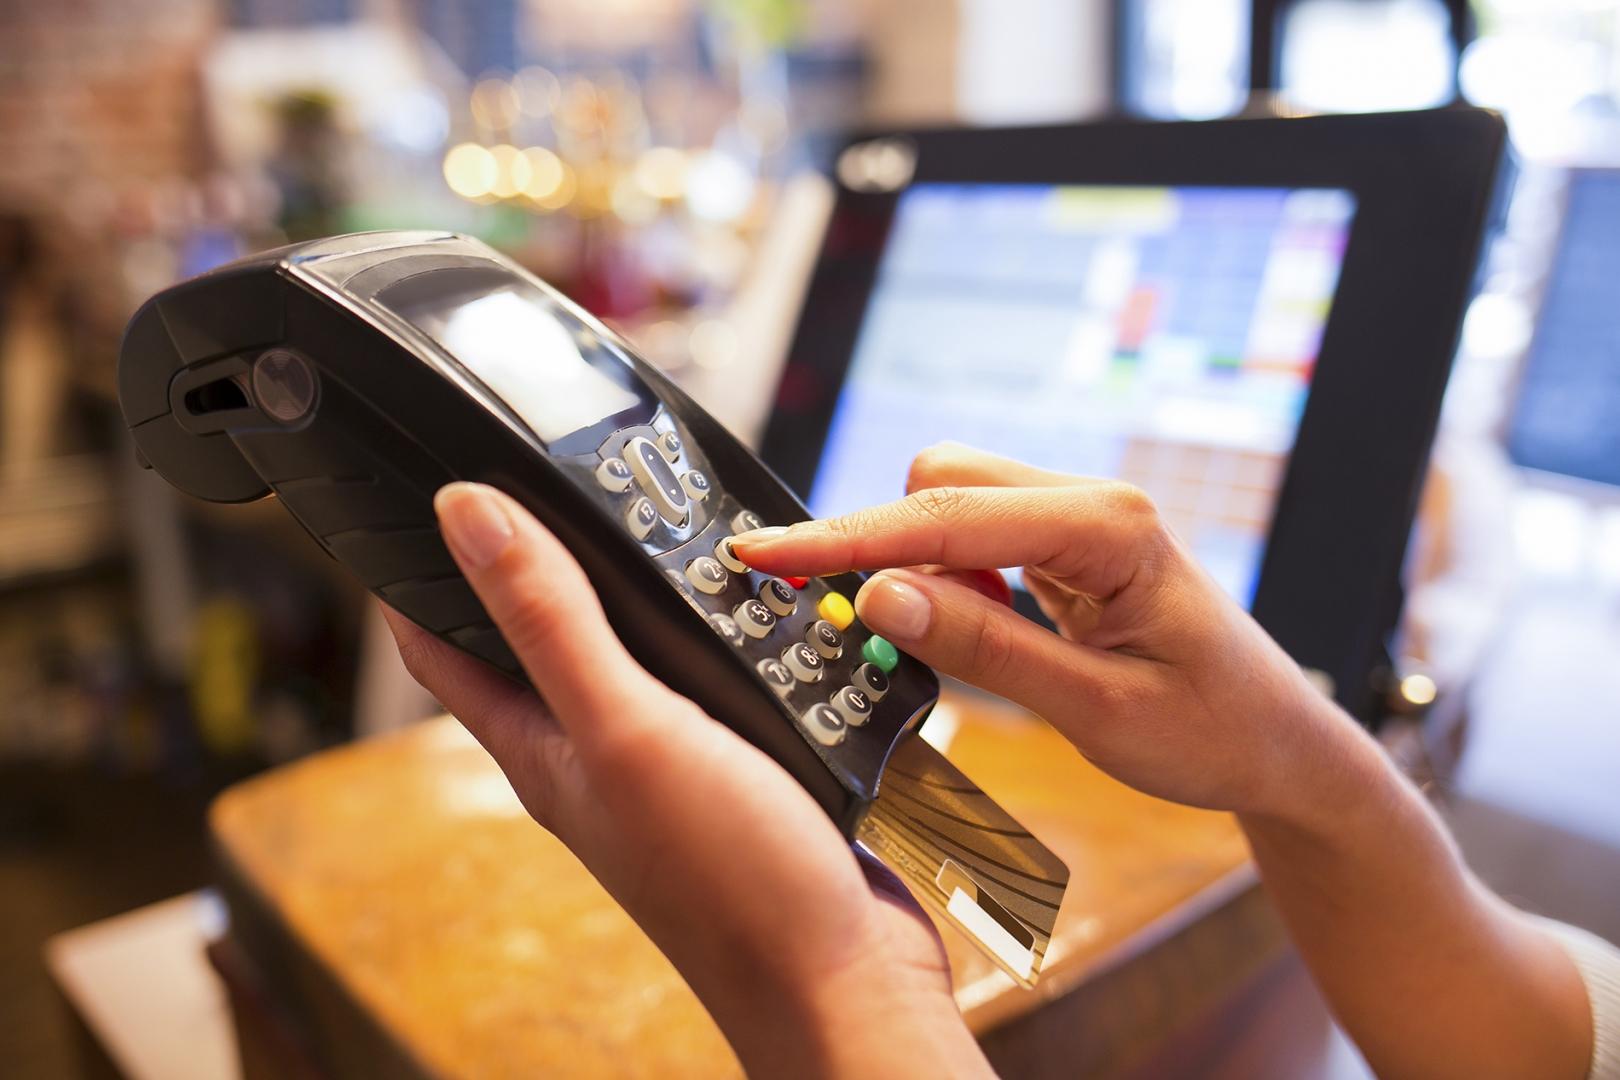 A shopper keys in their debit card code in a retail store